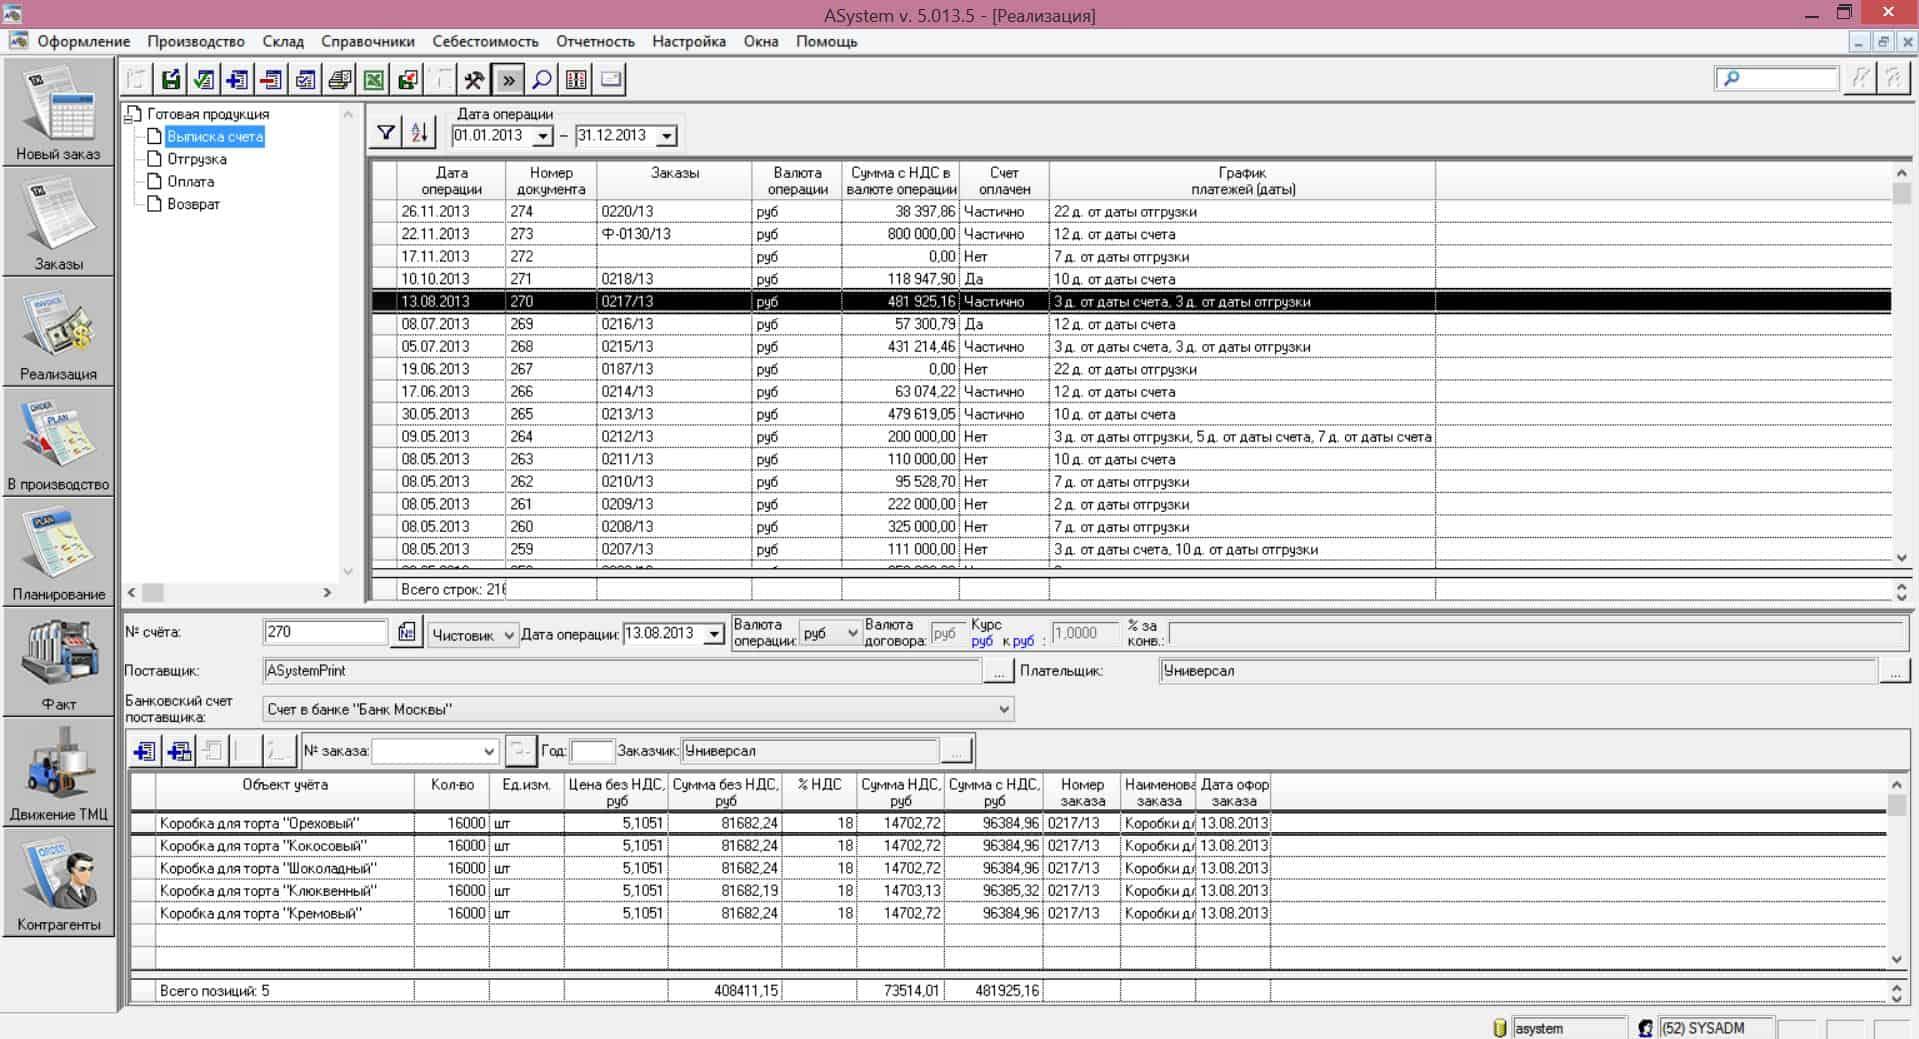 Реализация в системе управления полиграфическим предприятием ASystem